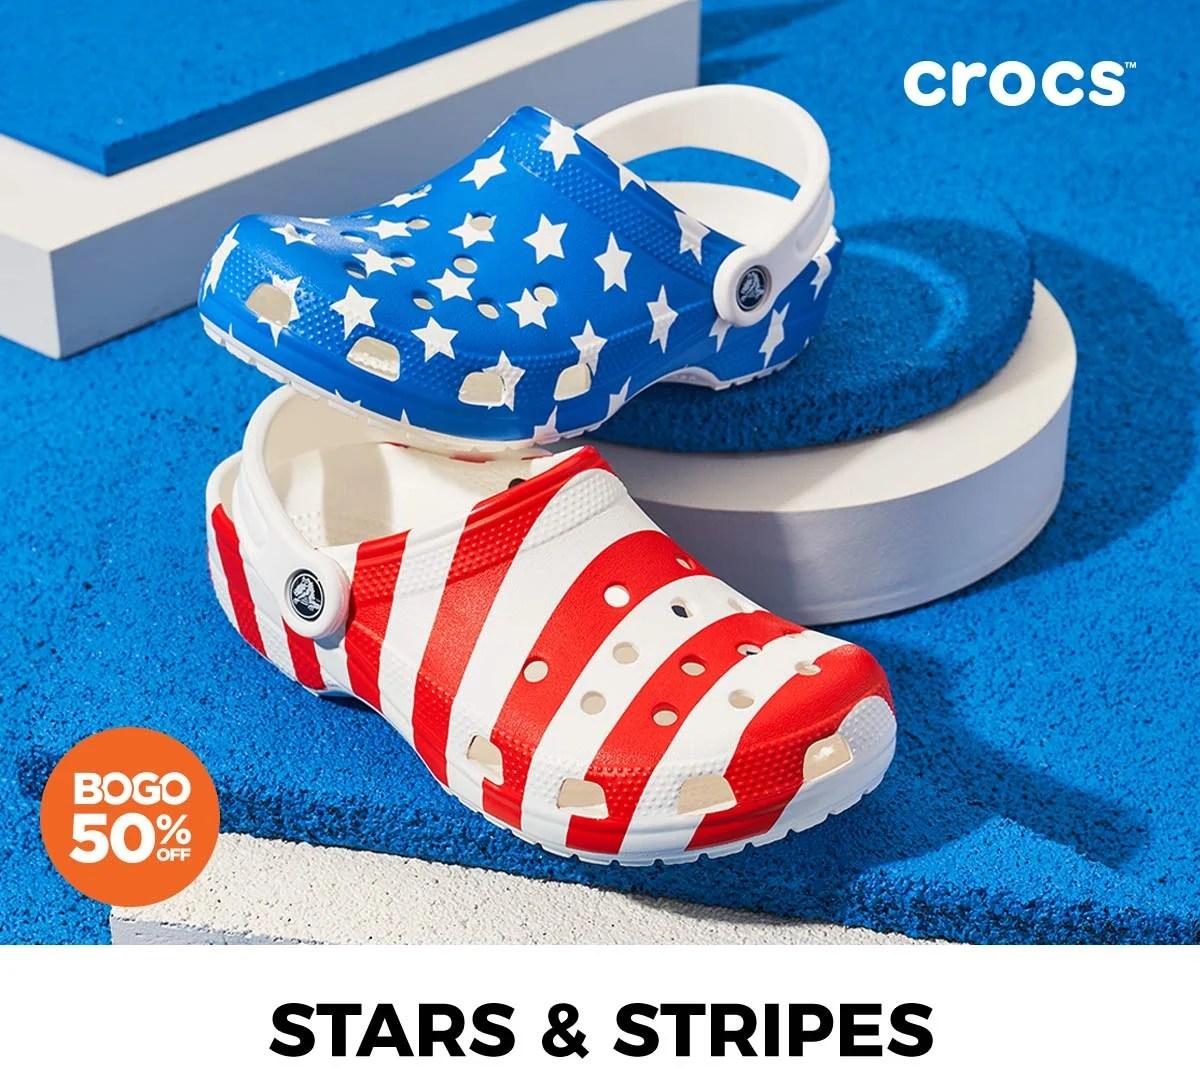 rack room shoes sandals crocs to